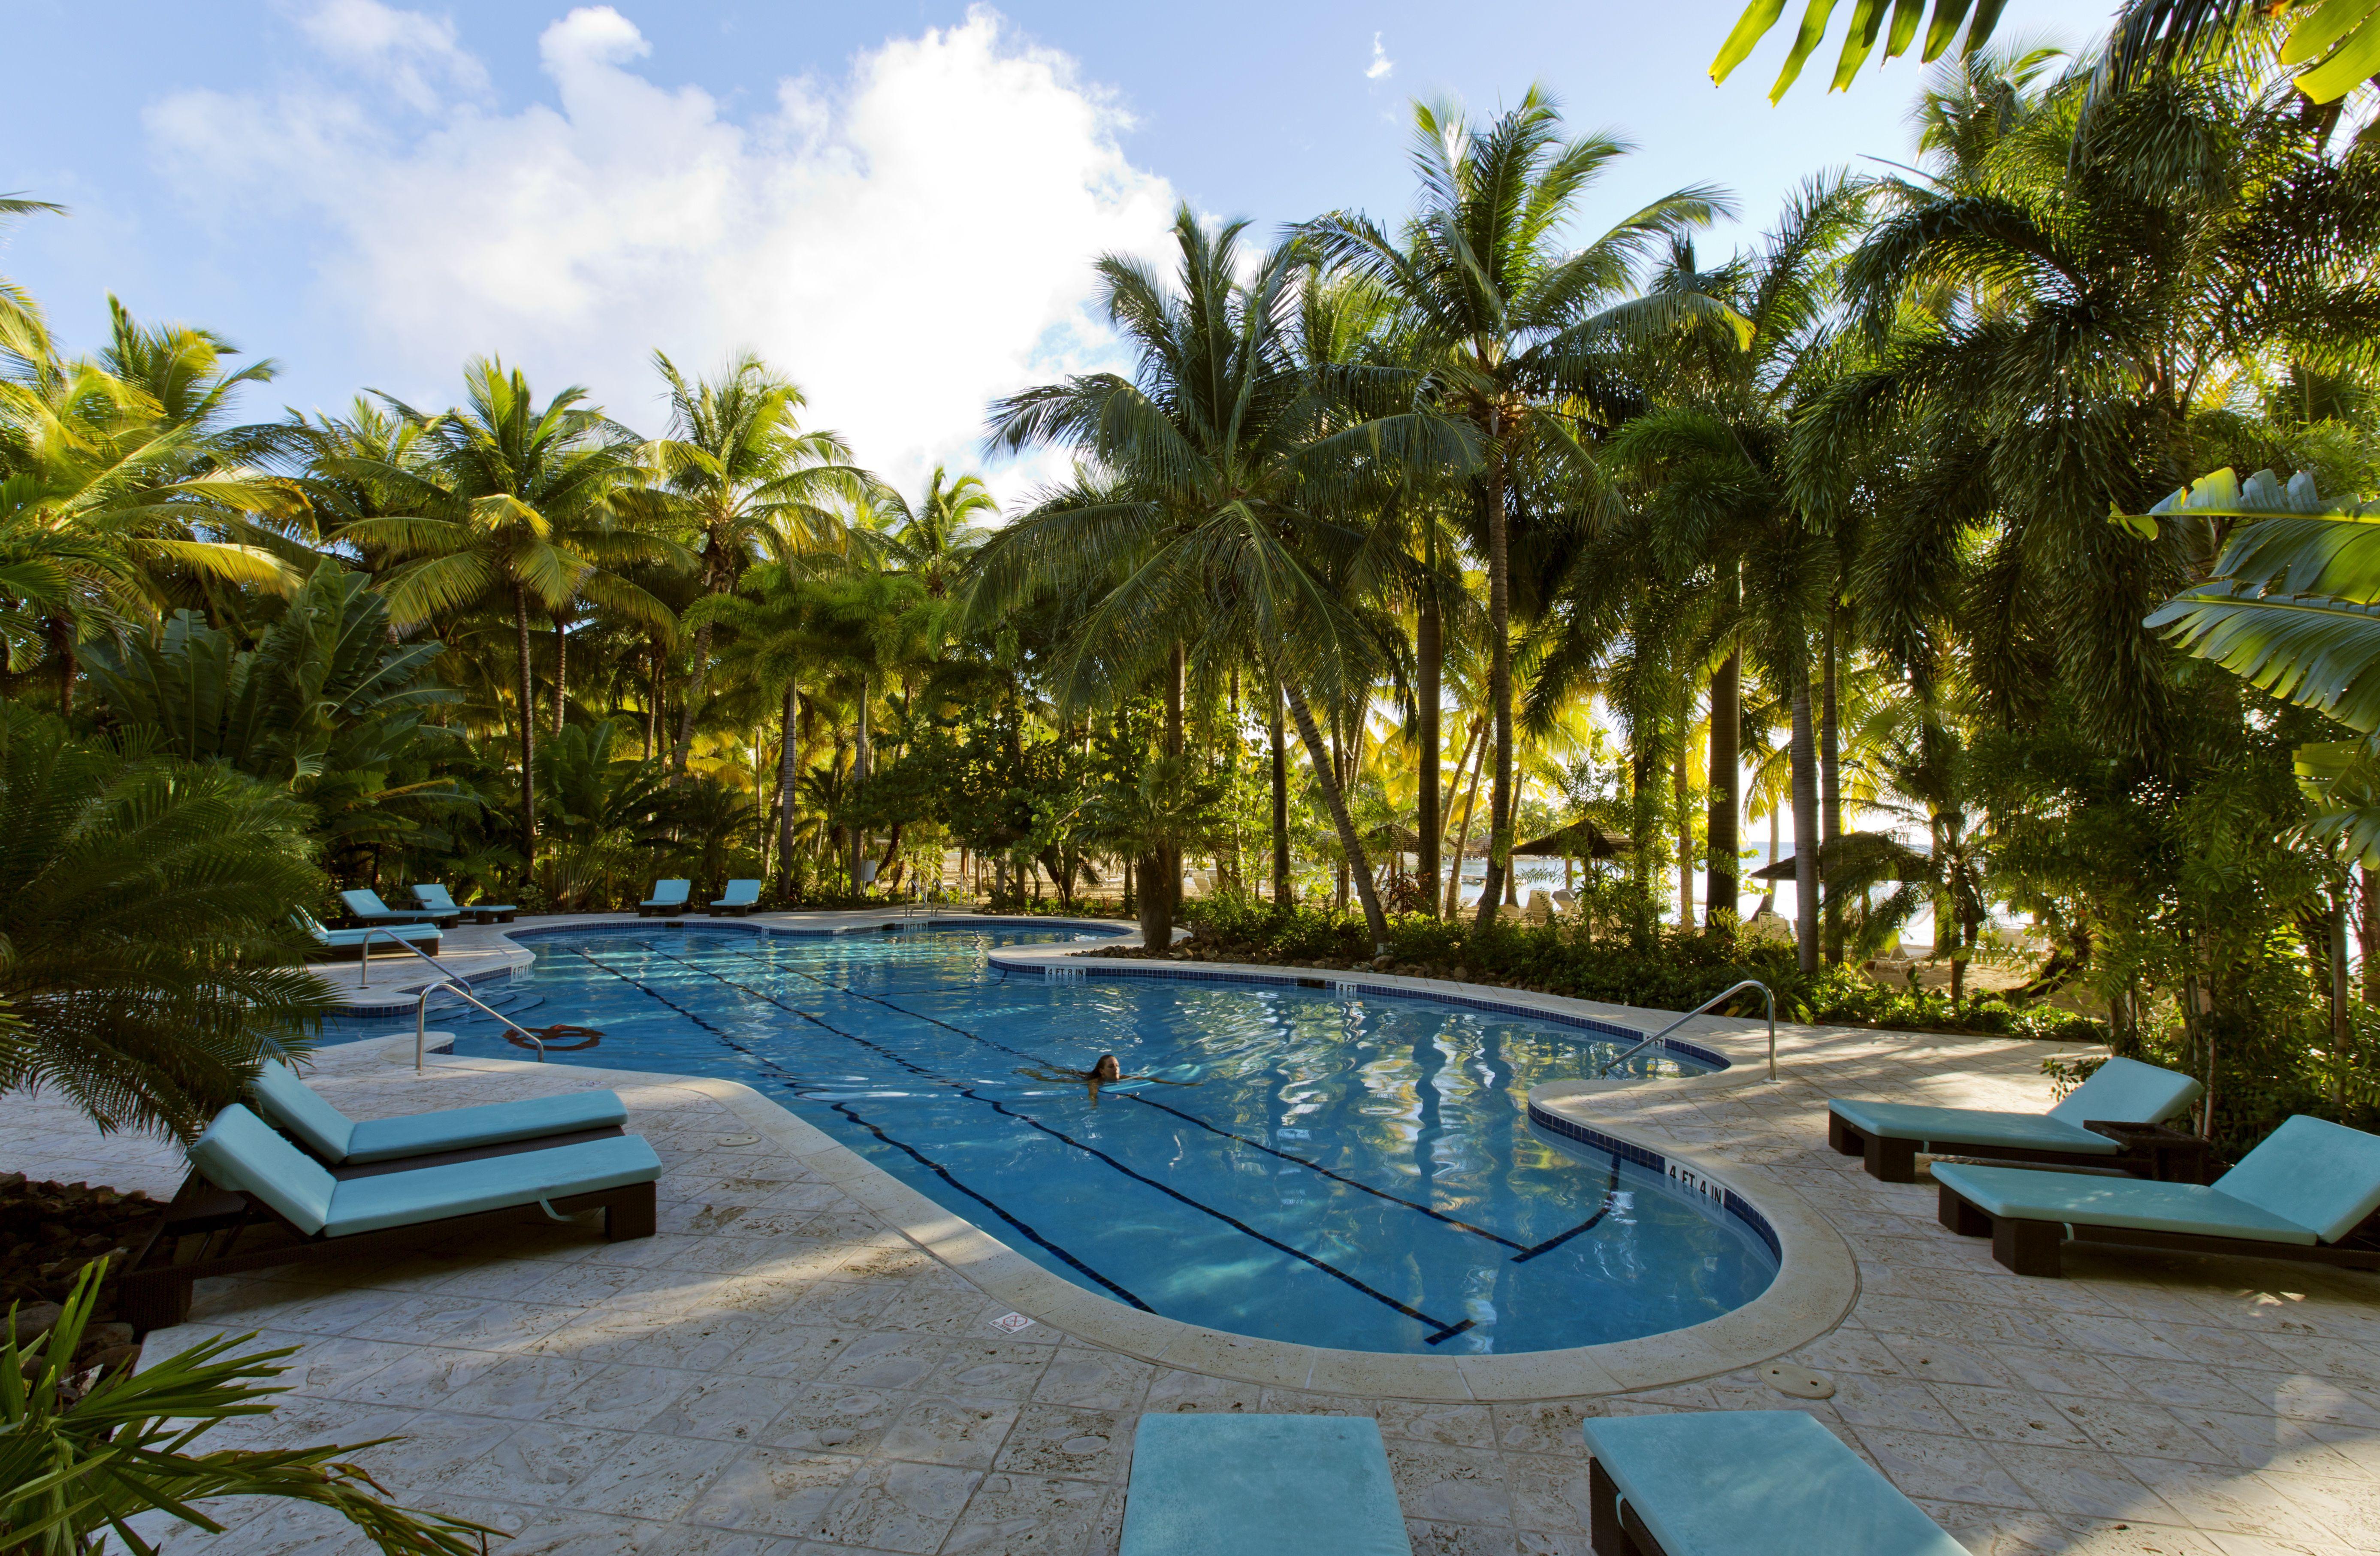 Pool at Curtain Bluff | Curtain Bluff Resort, Antigua | Pinterest ...